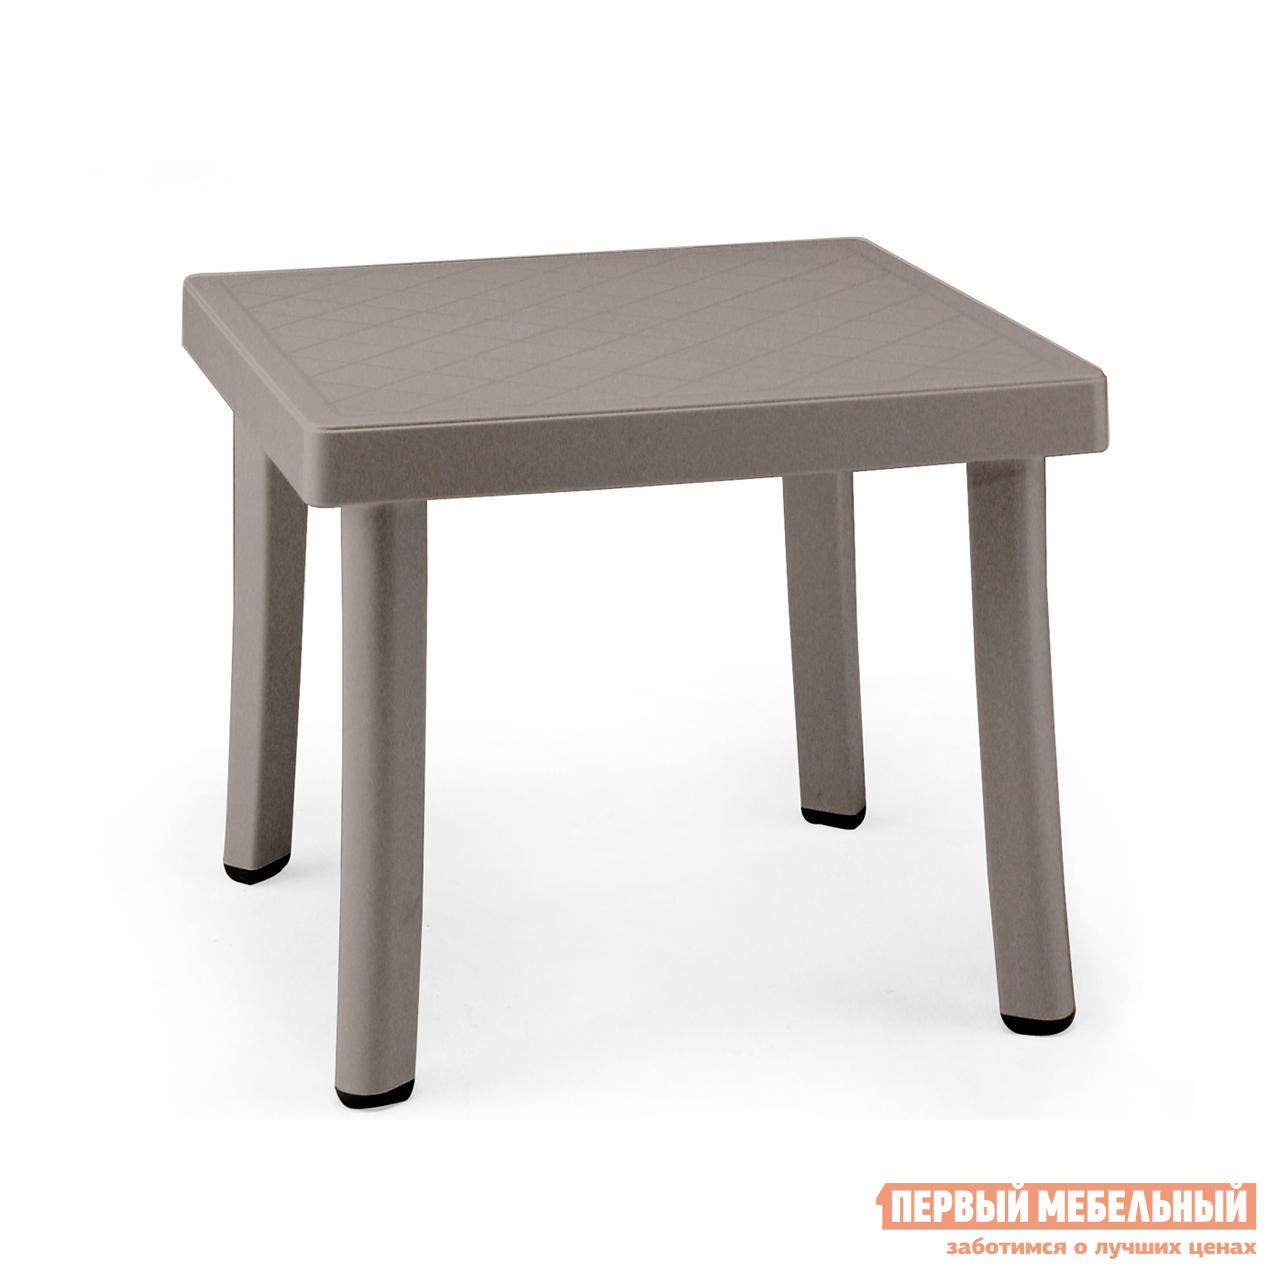 Пластиковый столик Рихаус RODI пластиковый стул рихаус riva bistrot